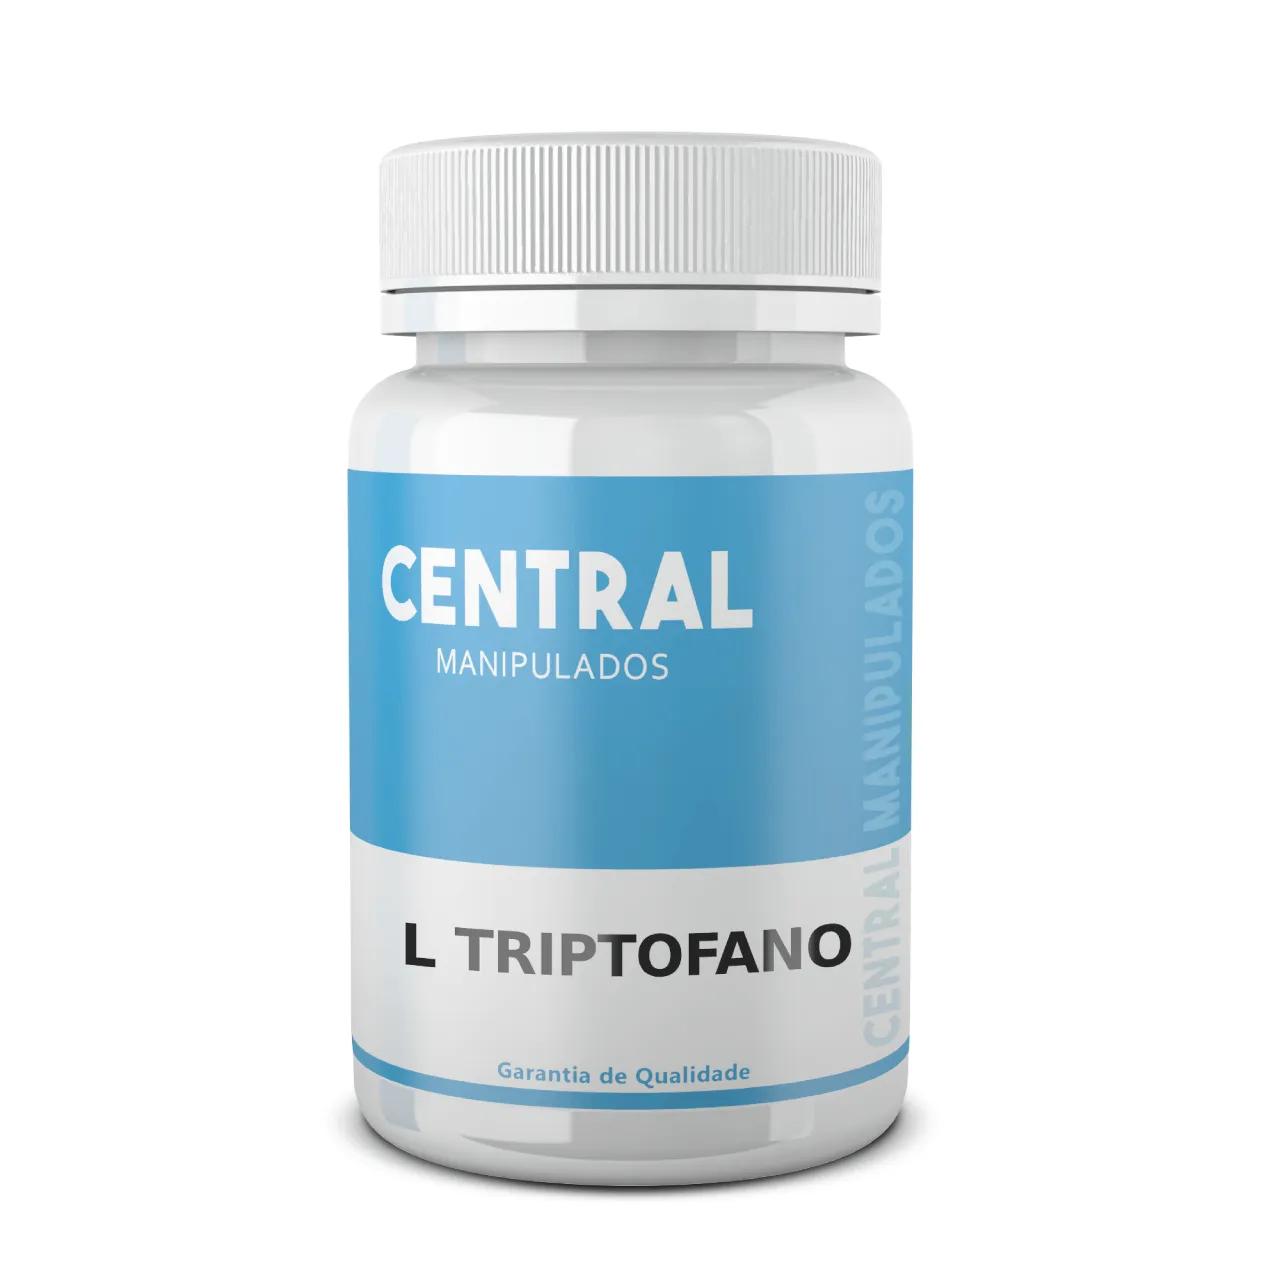 L-triptofano 250 mg - 180 cápsulas - Antidepressivo natural